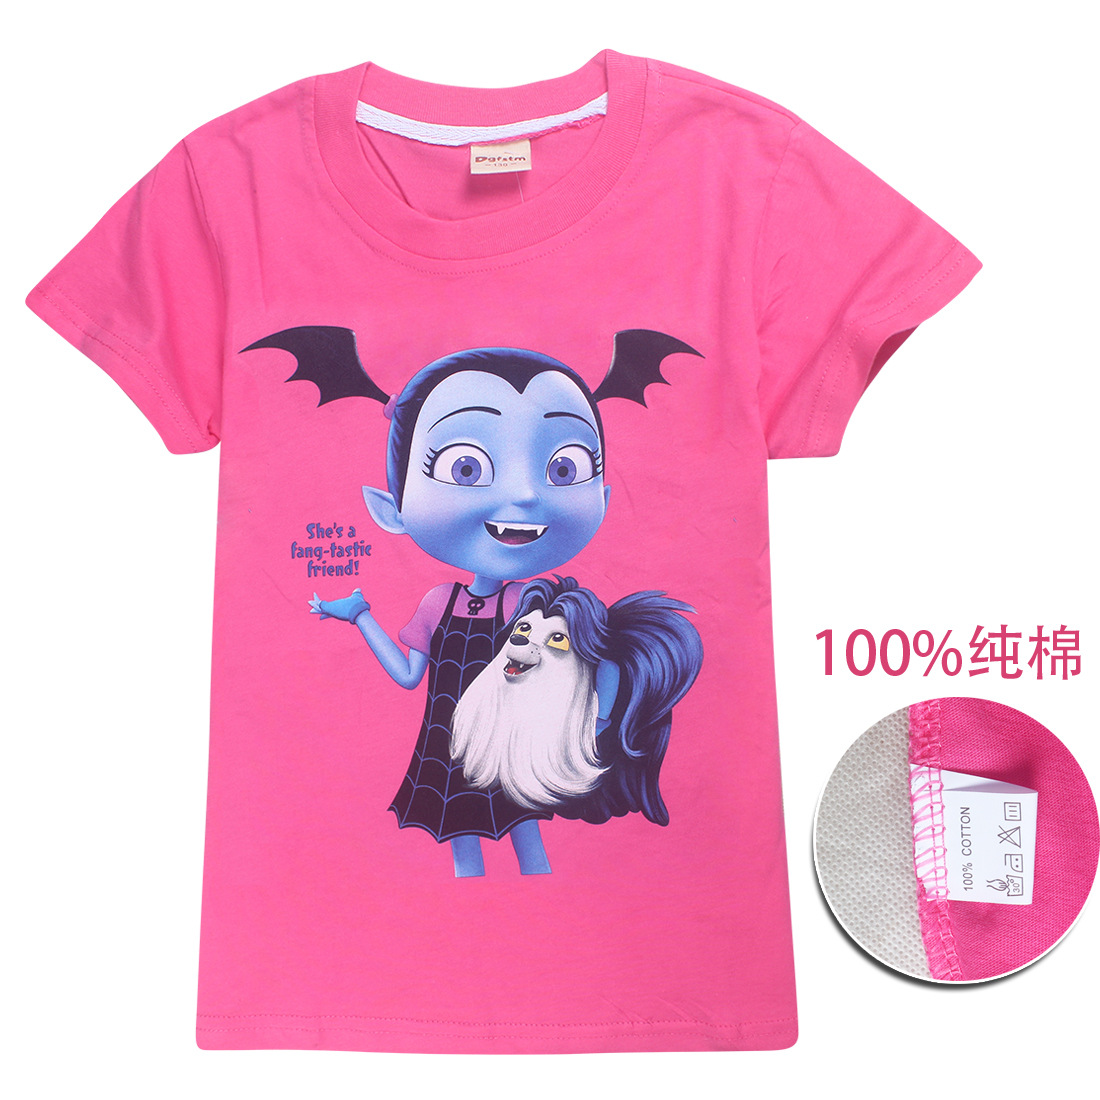 02b3f0e29 2018 Summer Kids girls T Shirt Cartoon Vampirina Baby girl Toddler Tees  Boys Cotton Tops and moana Tees Children trolls T shirts-in Tees from  Mother & Kids ...